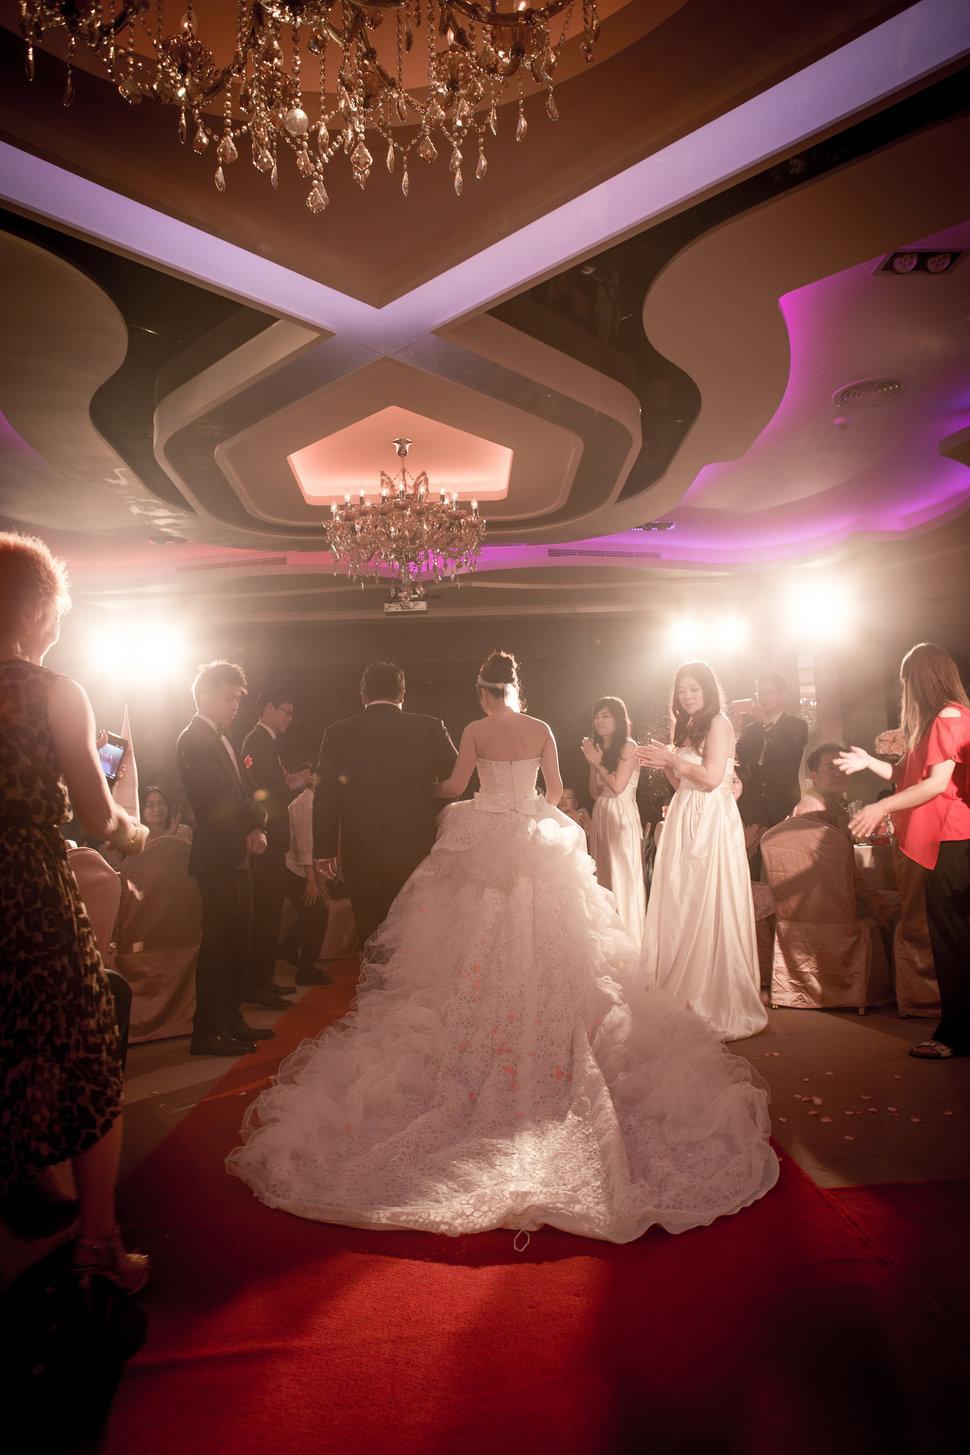 18PHOTO-爵名❤️ 瓊文(編號:220387) - 18PHOTO 婚紗影像攝影工作室 - 結婚吧